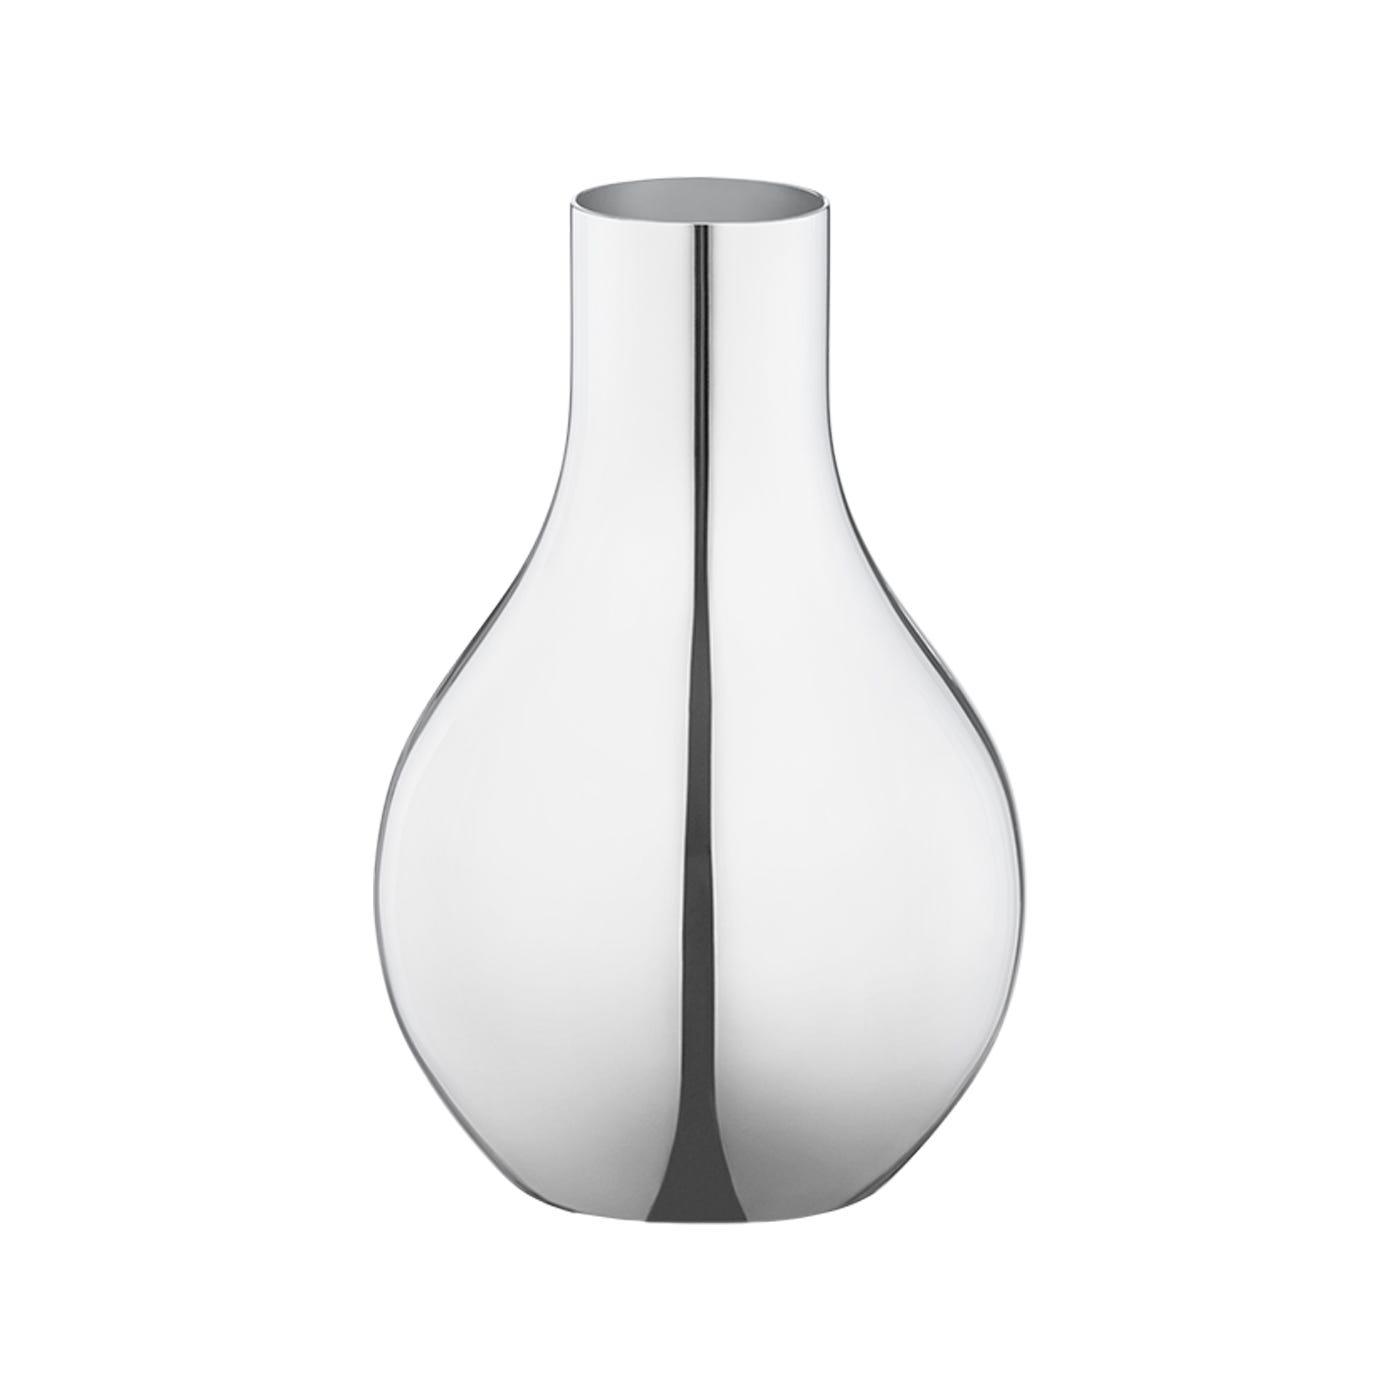 Cafu Vase Steel Small